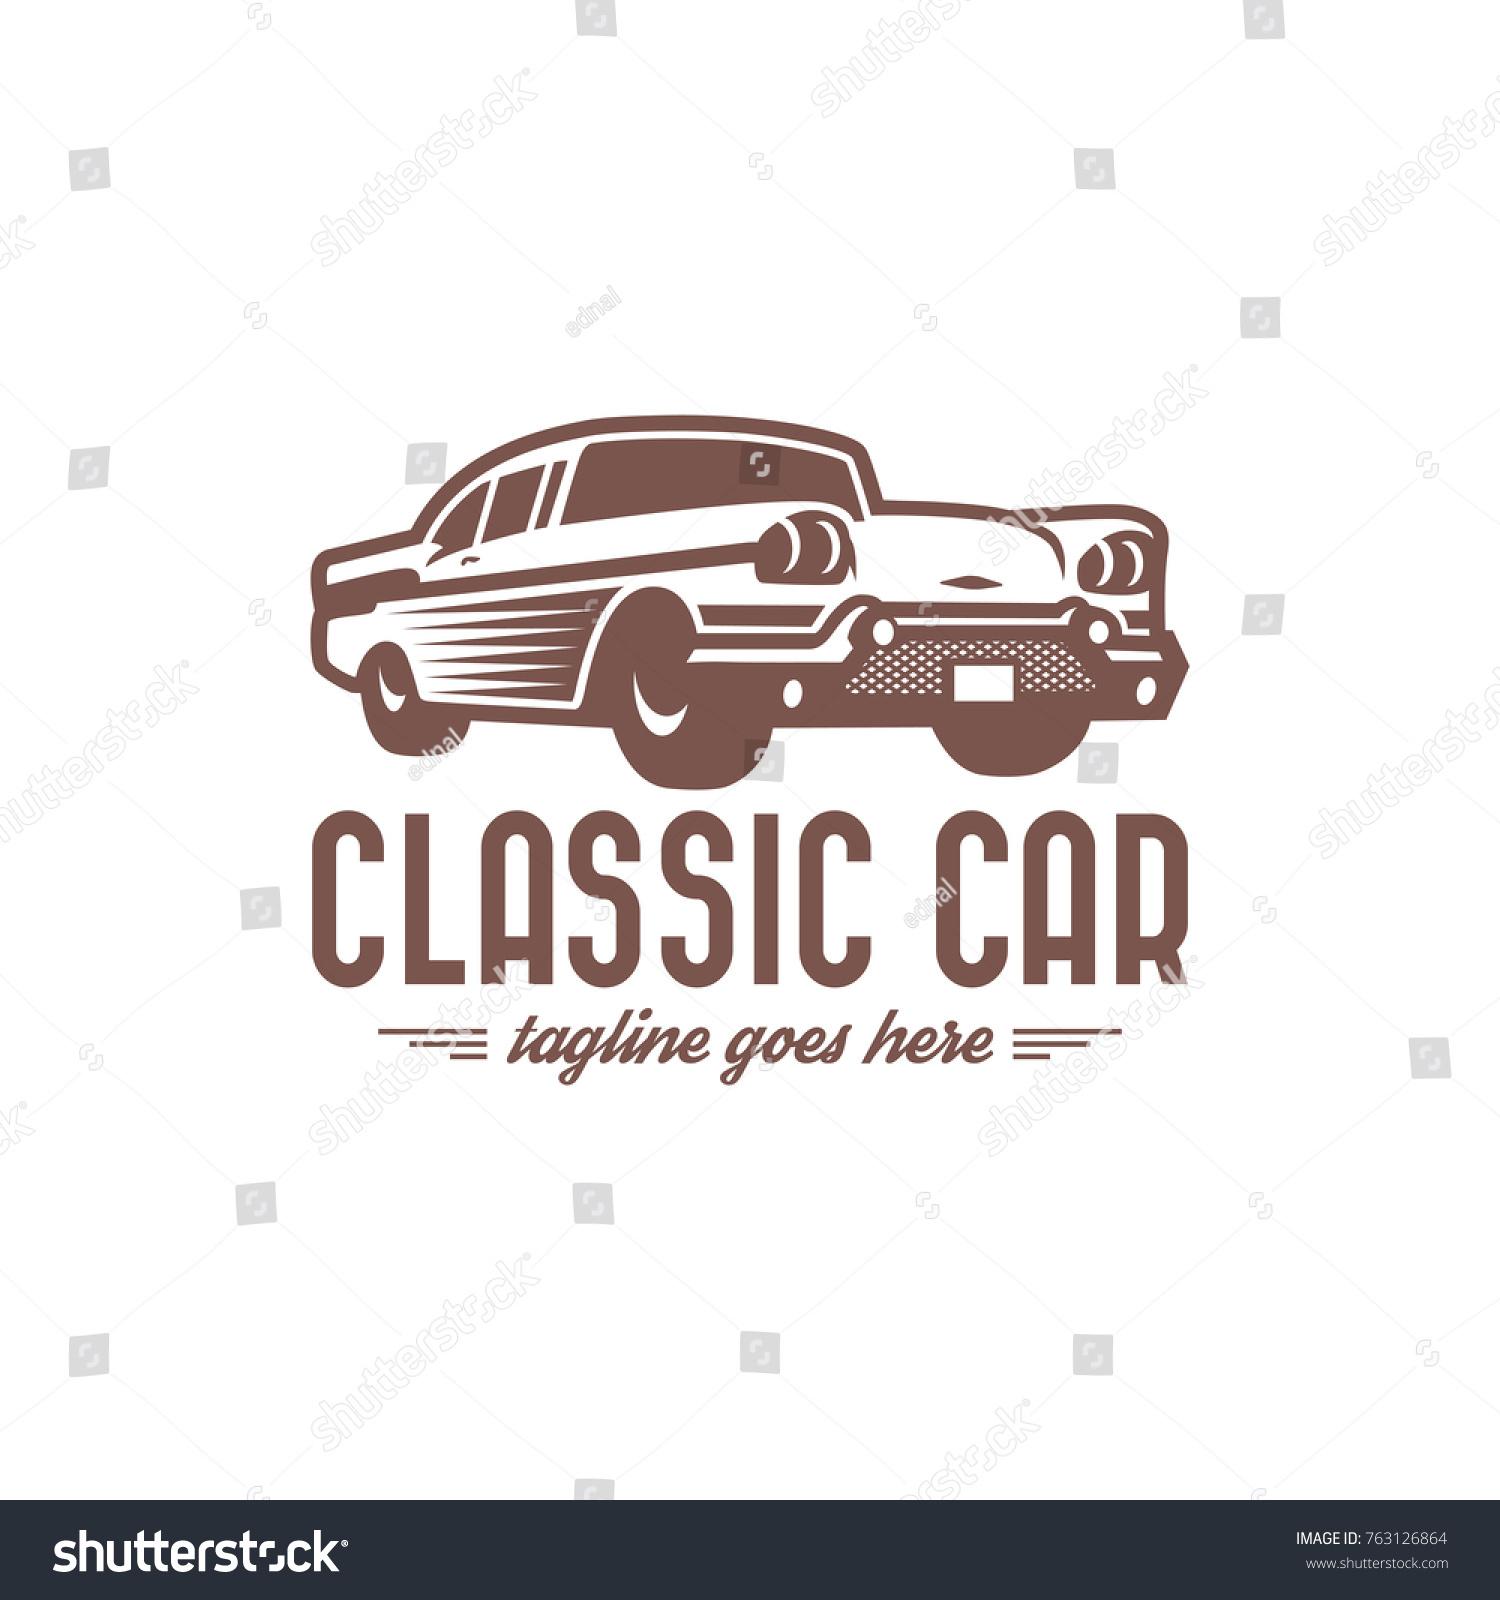 Template Classic Vintage Retro Car Logo Stock Vector HD (Royalty ...